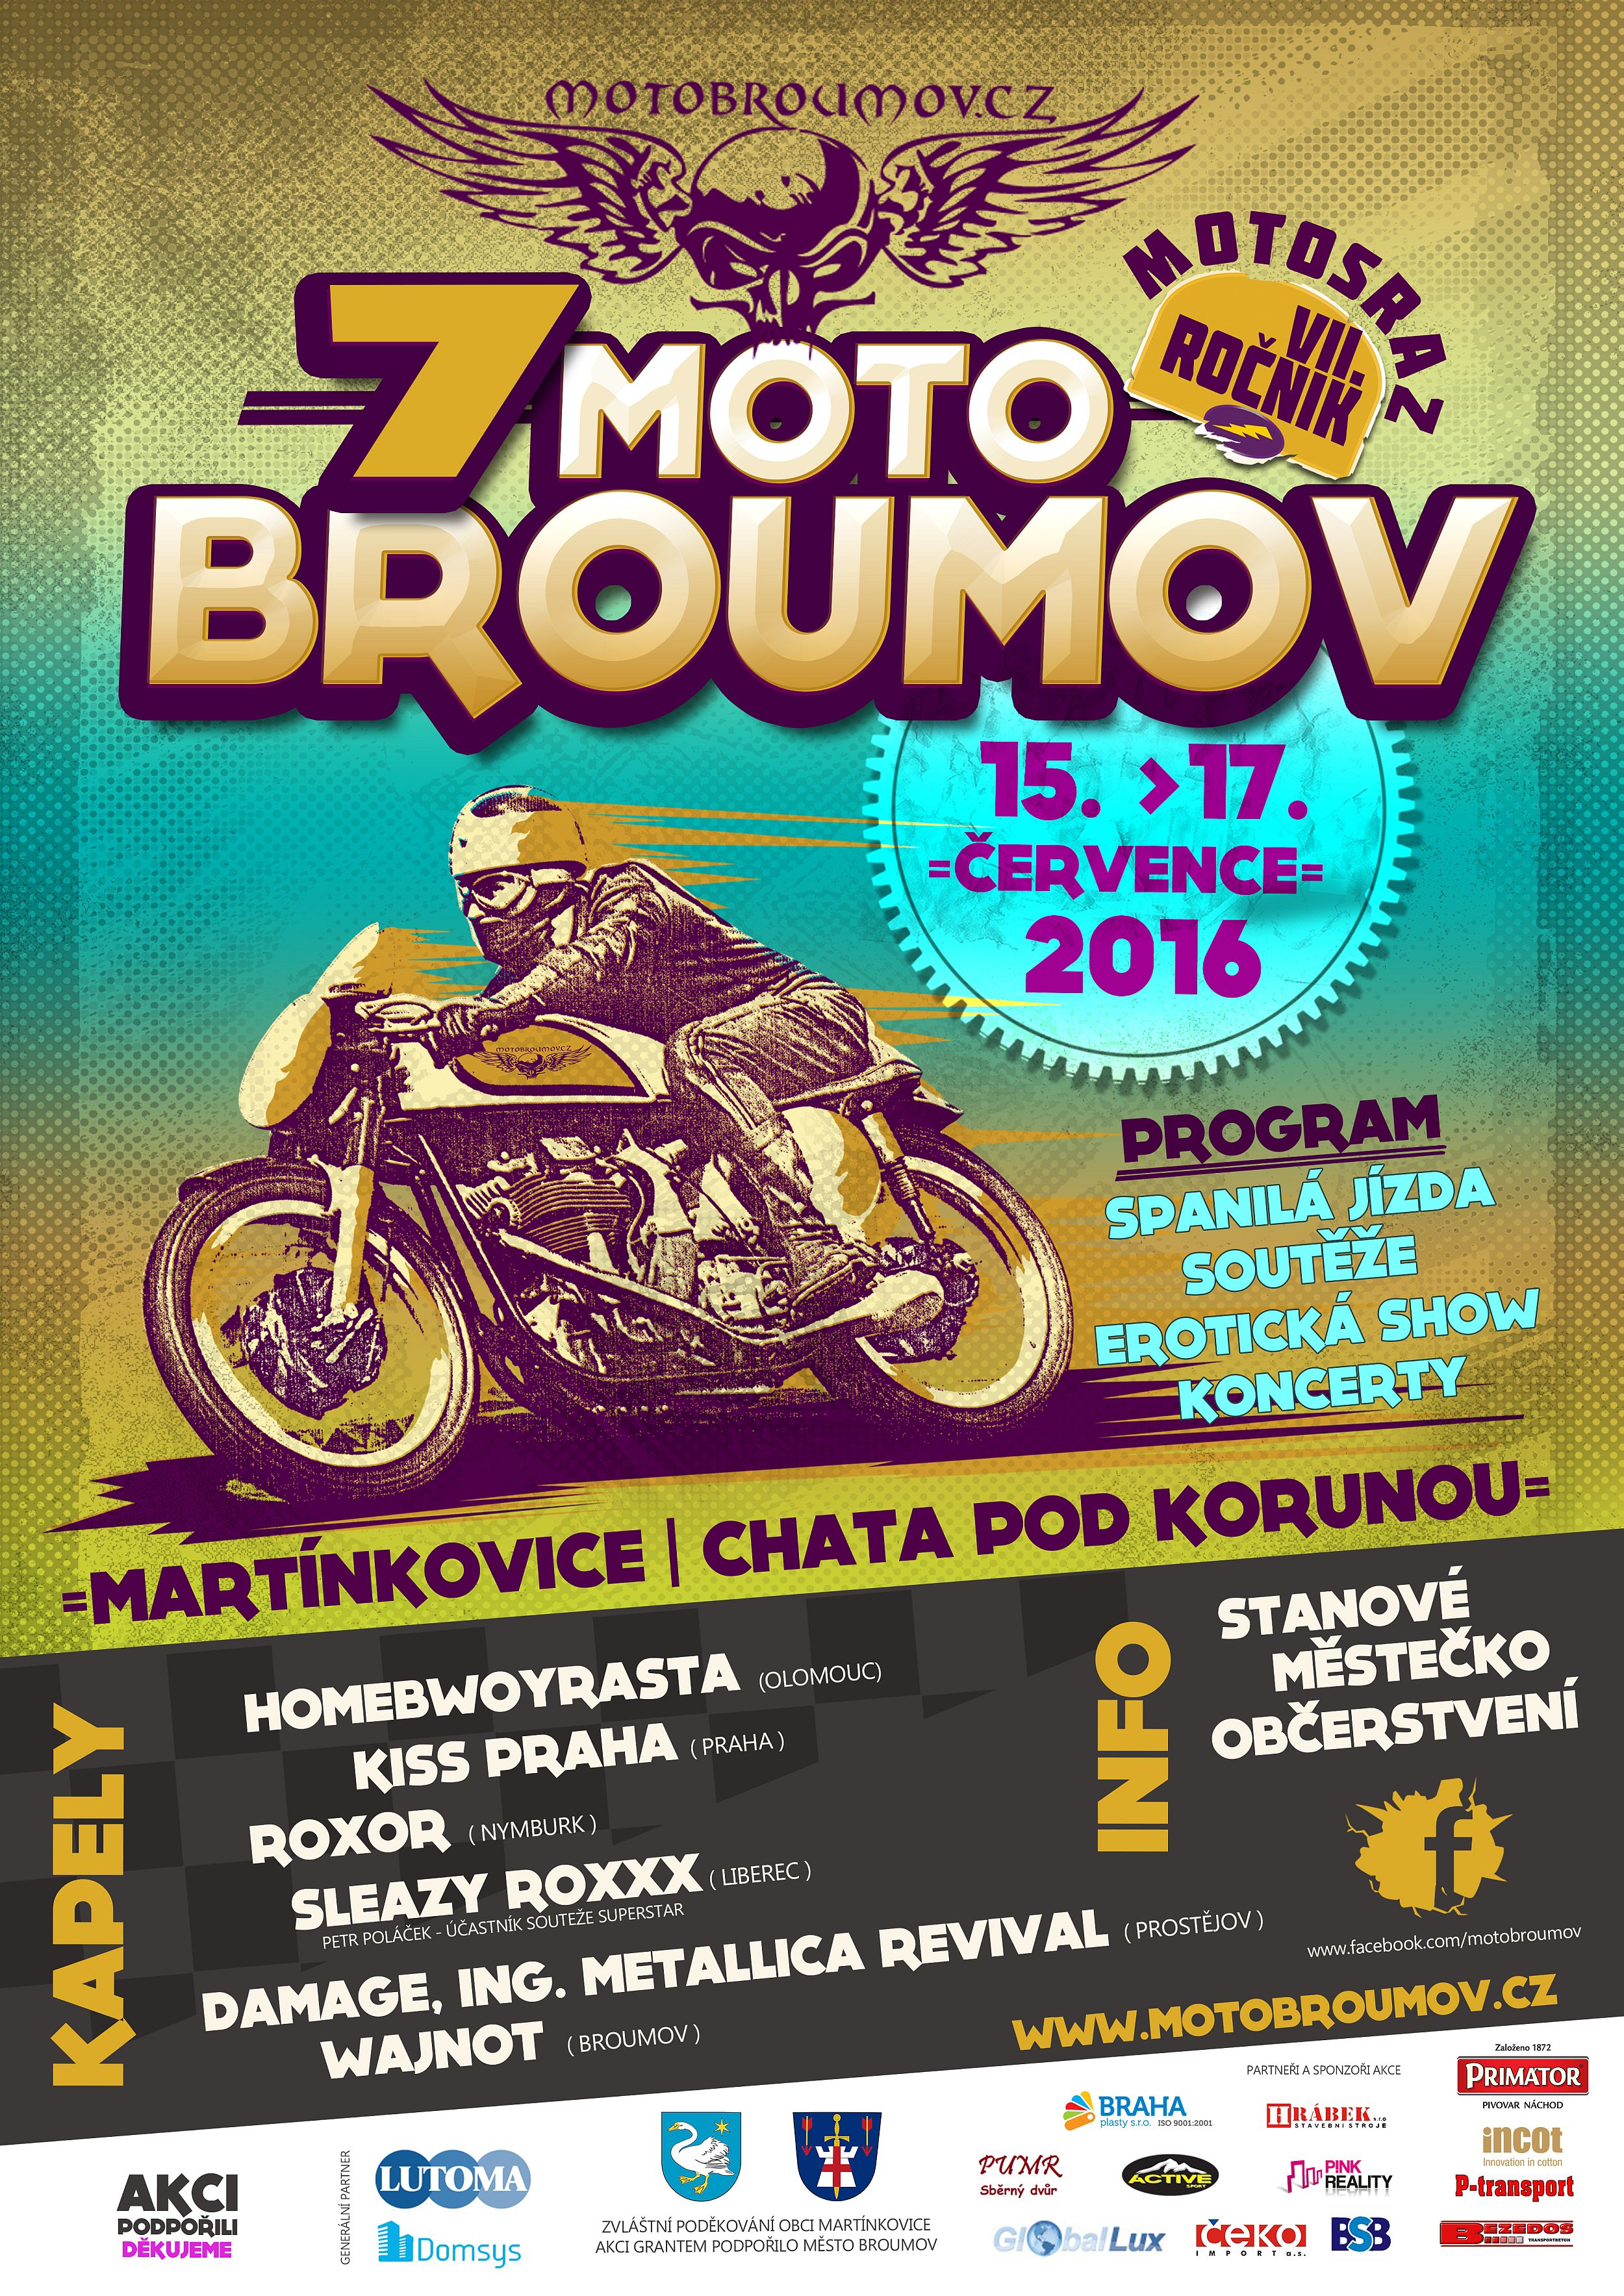 MOTOSRAZ-BROUMOV-ROXOR OD 16:00